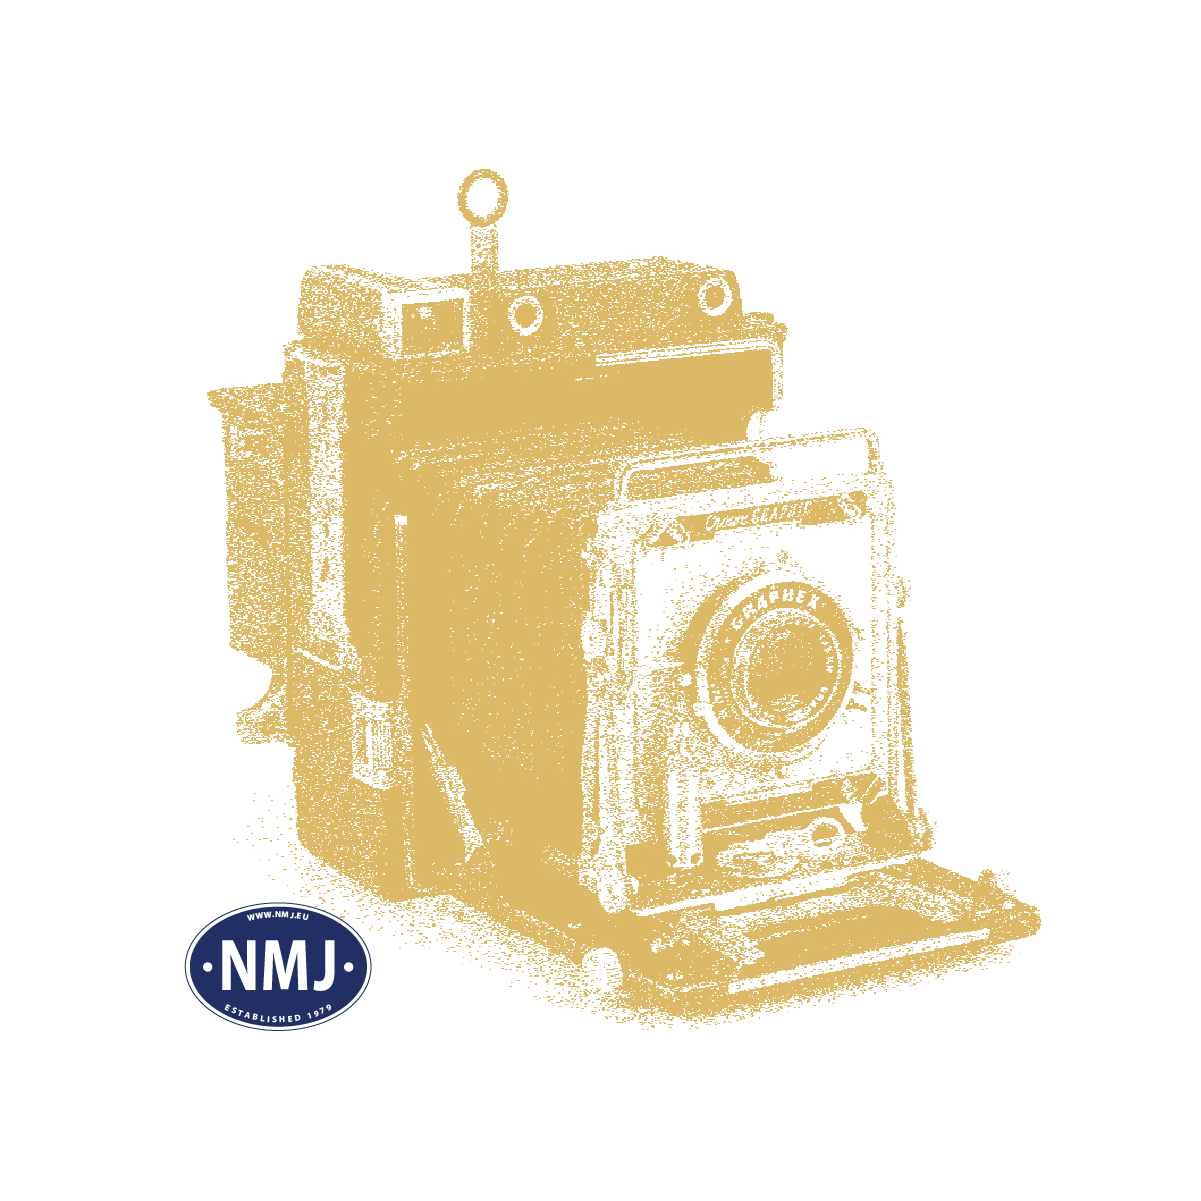 NMJT599.104 - *NMJ Exclusive* Scania Vabis LB76 Vogntog, Findus Dypfryste produkter